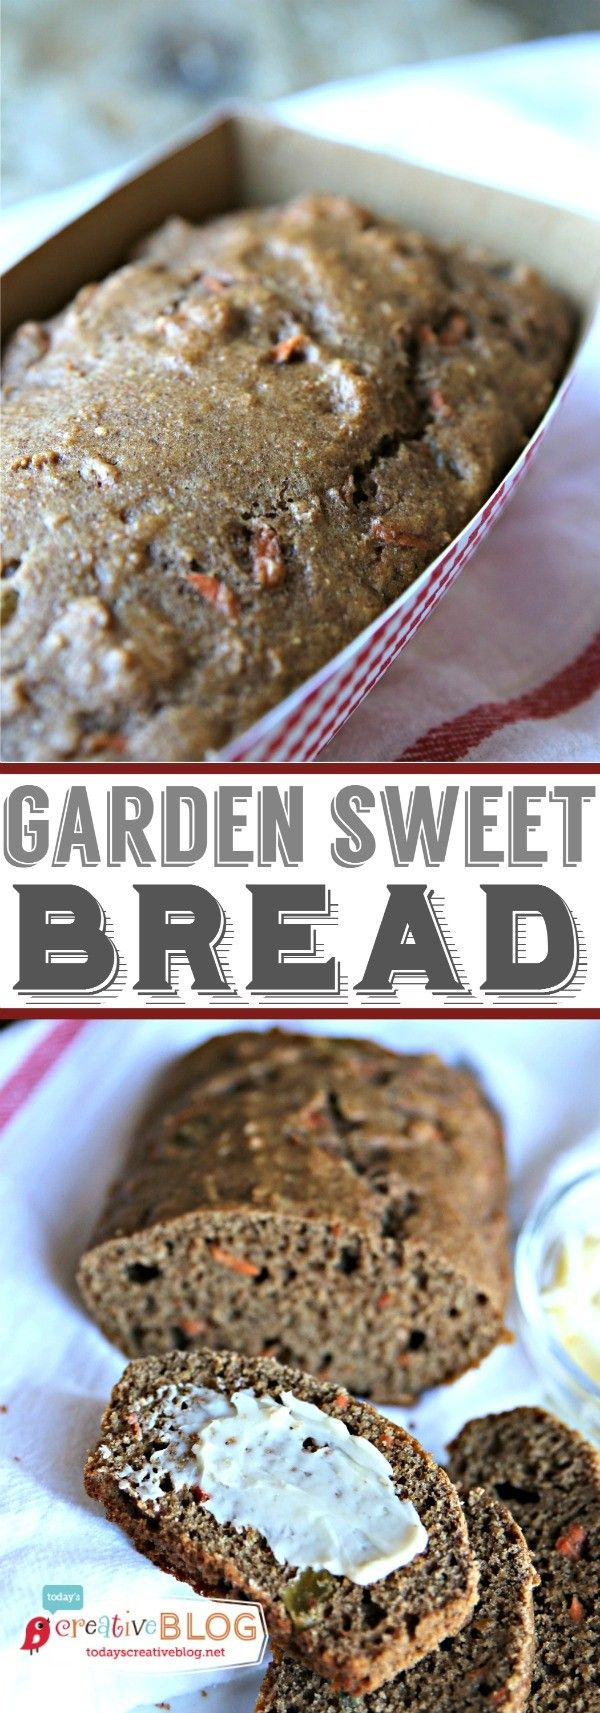 Garden Sweet Bread Recipe | TodaysCreativeBlog.net